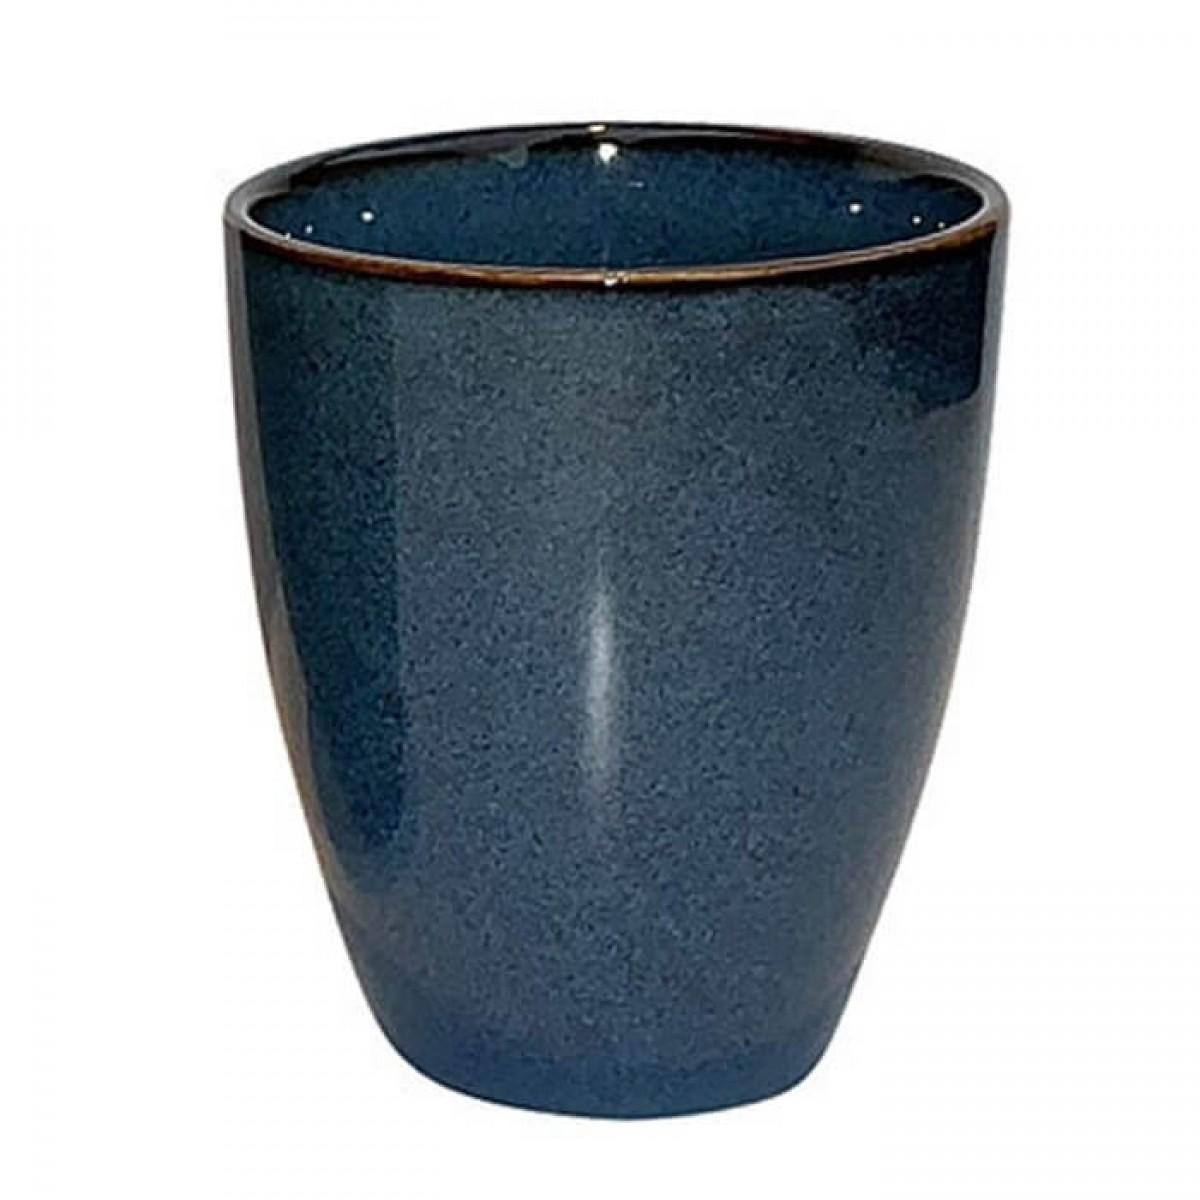 DACORE Krus uden hank 8 x 10 cm blå